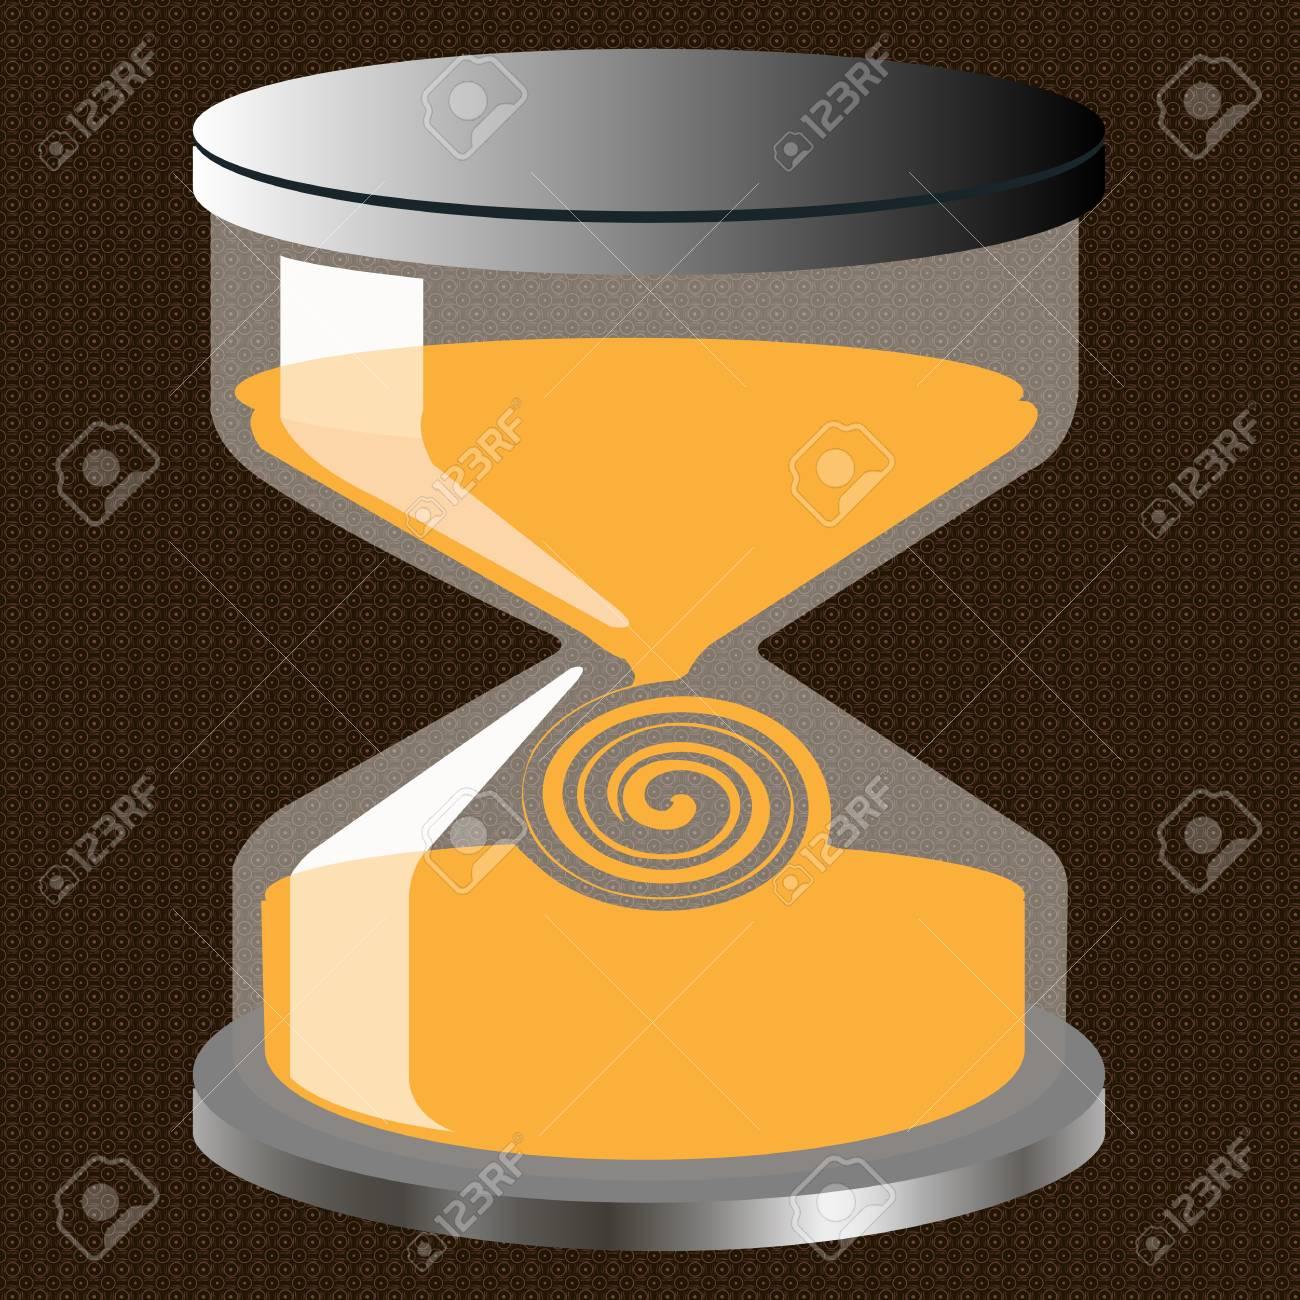 Decorative Hourglass Figure On Fone Seamless Patterned Royalty Free - Decorative-hourglass